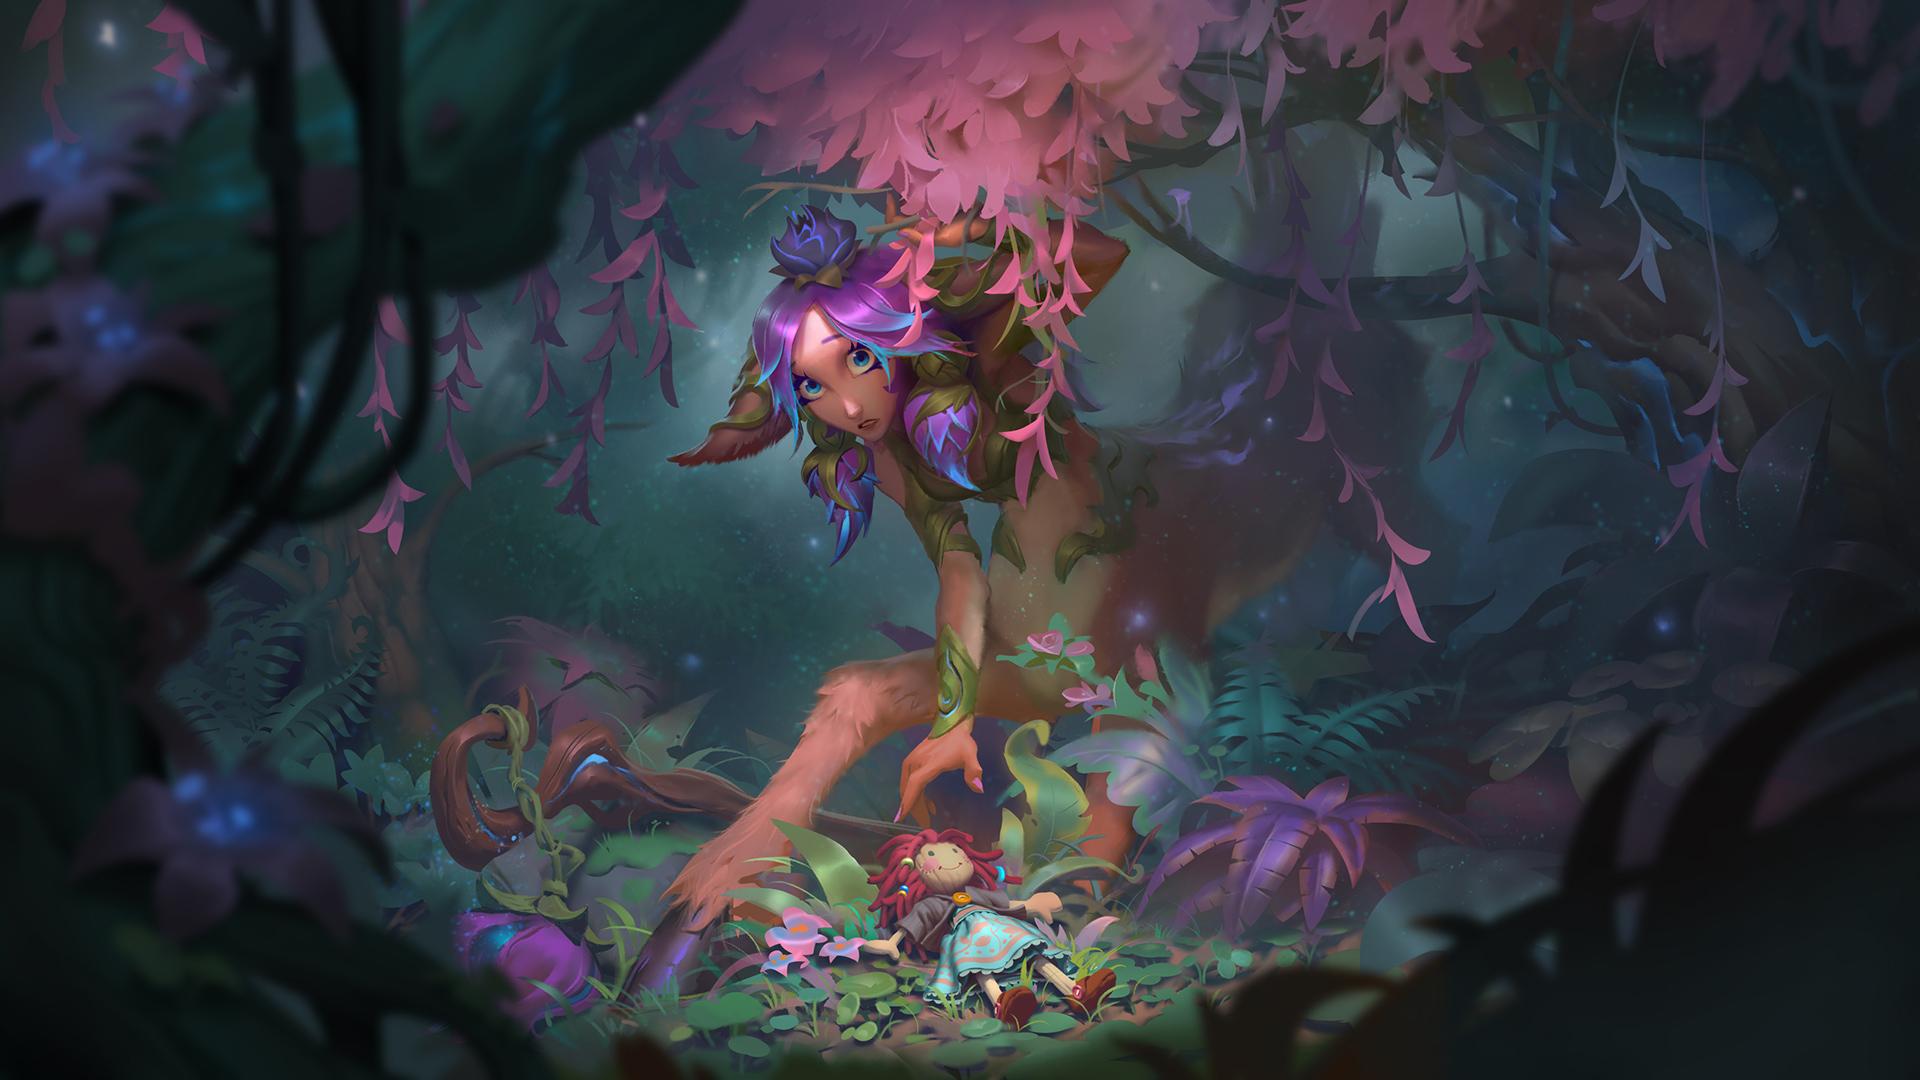 Lillia The Garden of Dreaming